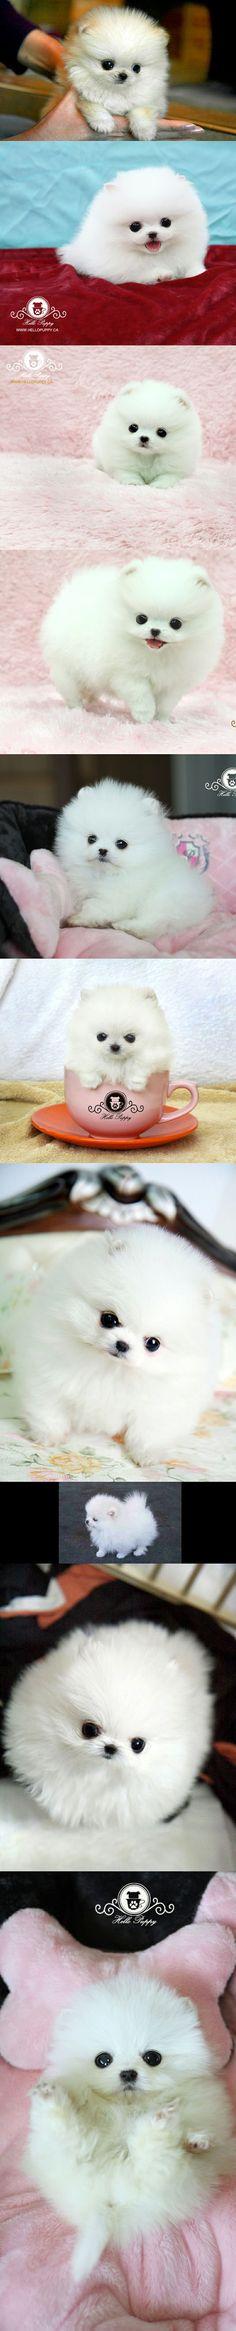 Teacup micro Pomeranian puppies